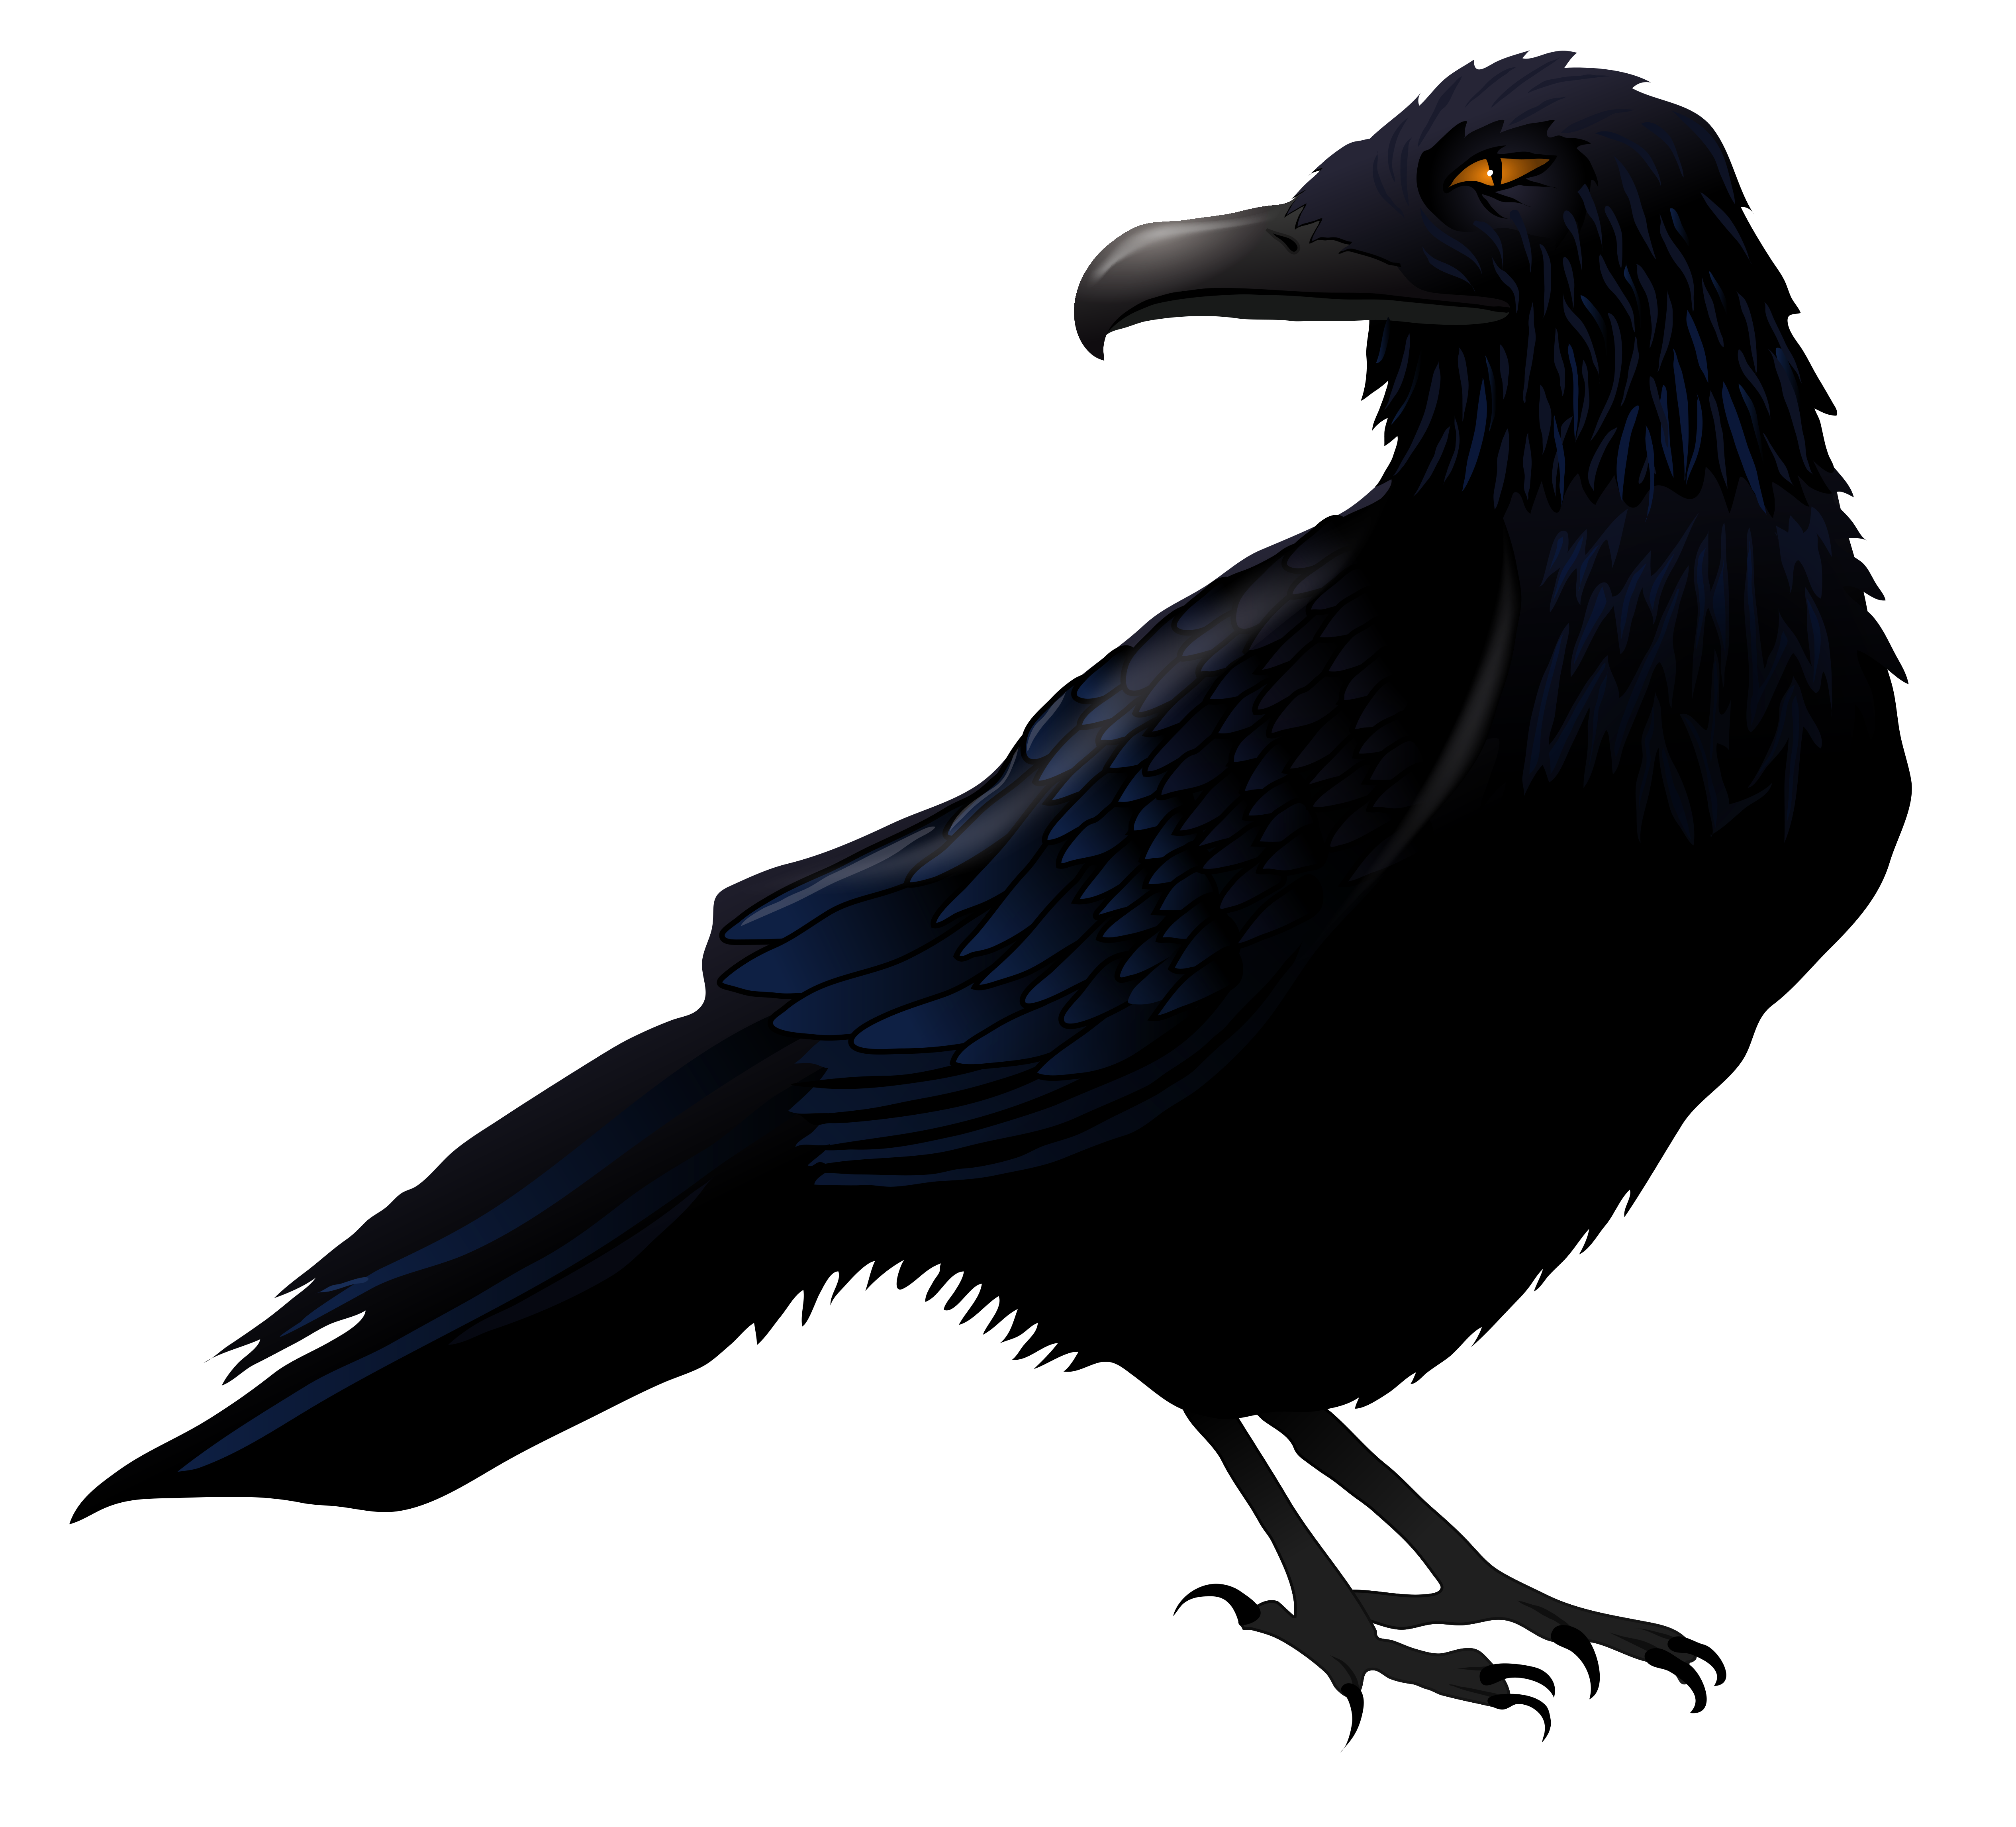 halloween raven clipart - Clipground